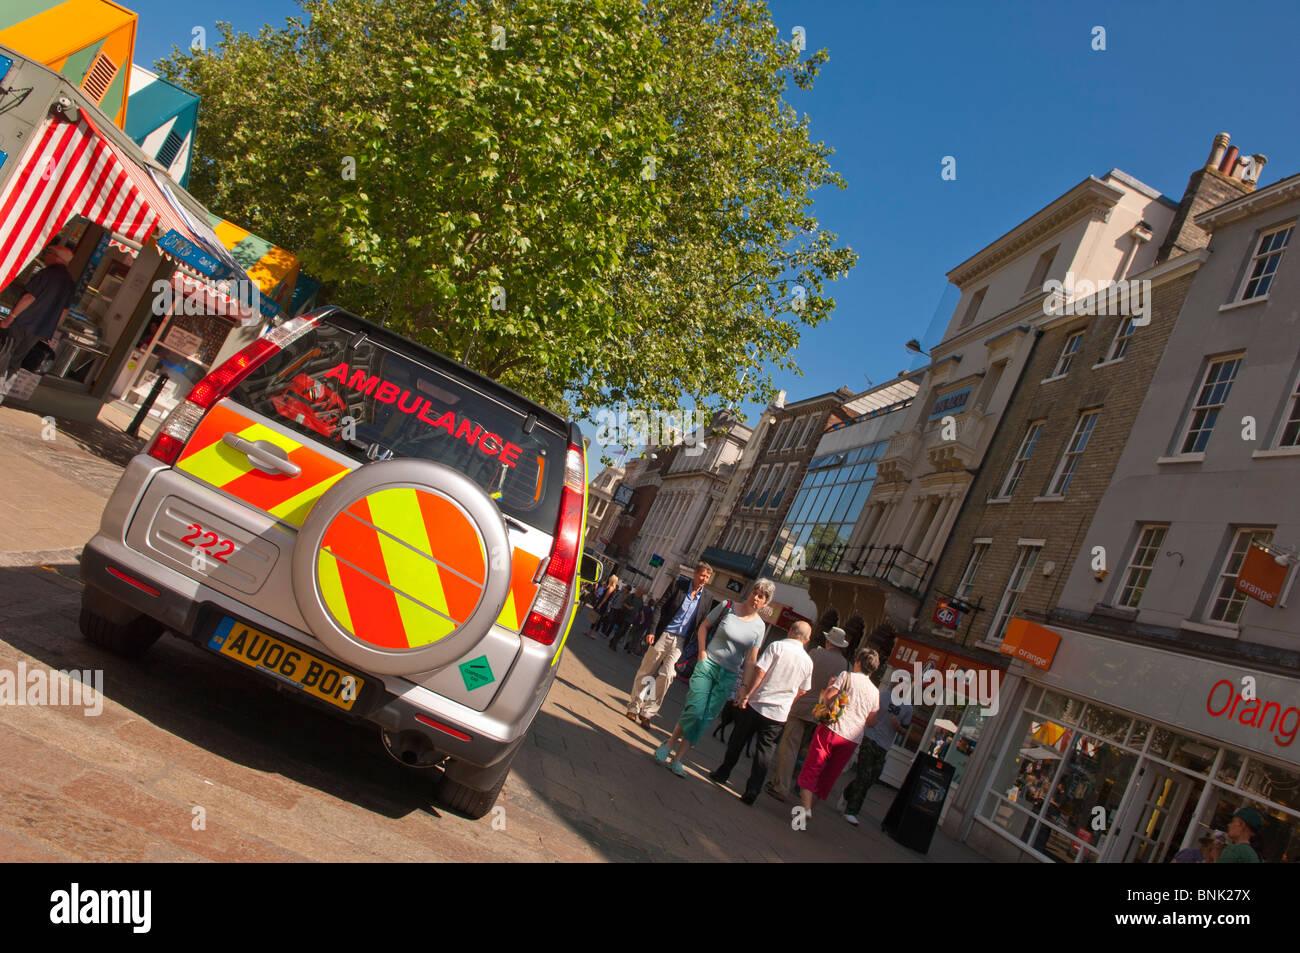 A 4 wheel drive ambulance emergency vehicle in Norwich , Norfolk , England , Great Britain , Uk - Stock Image